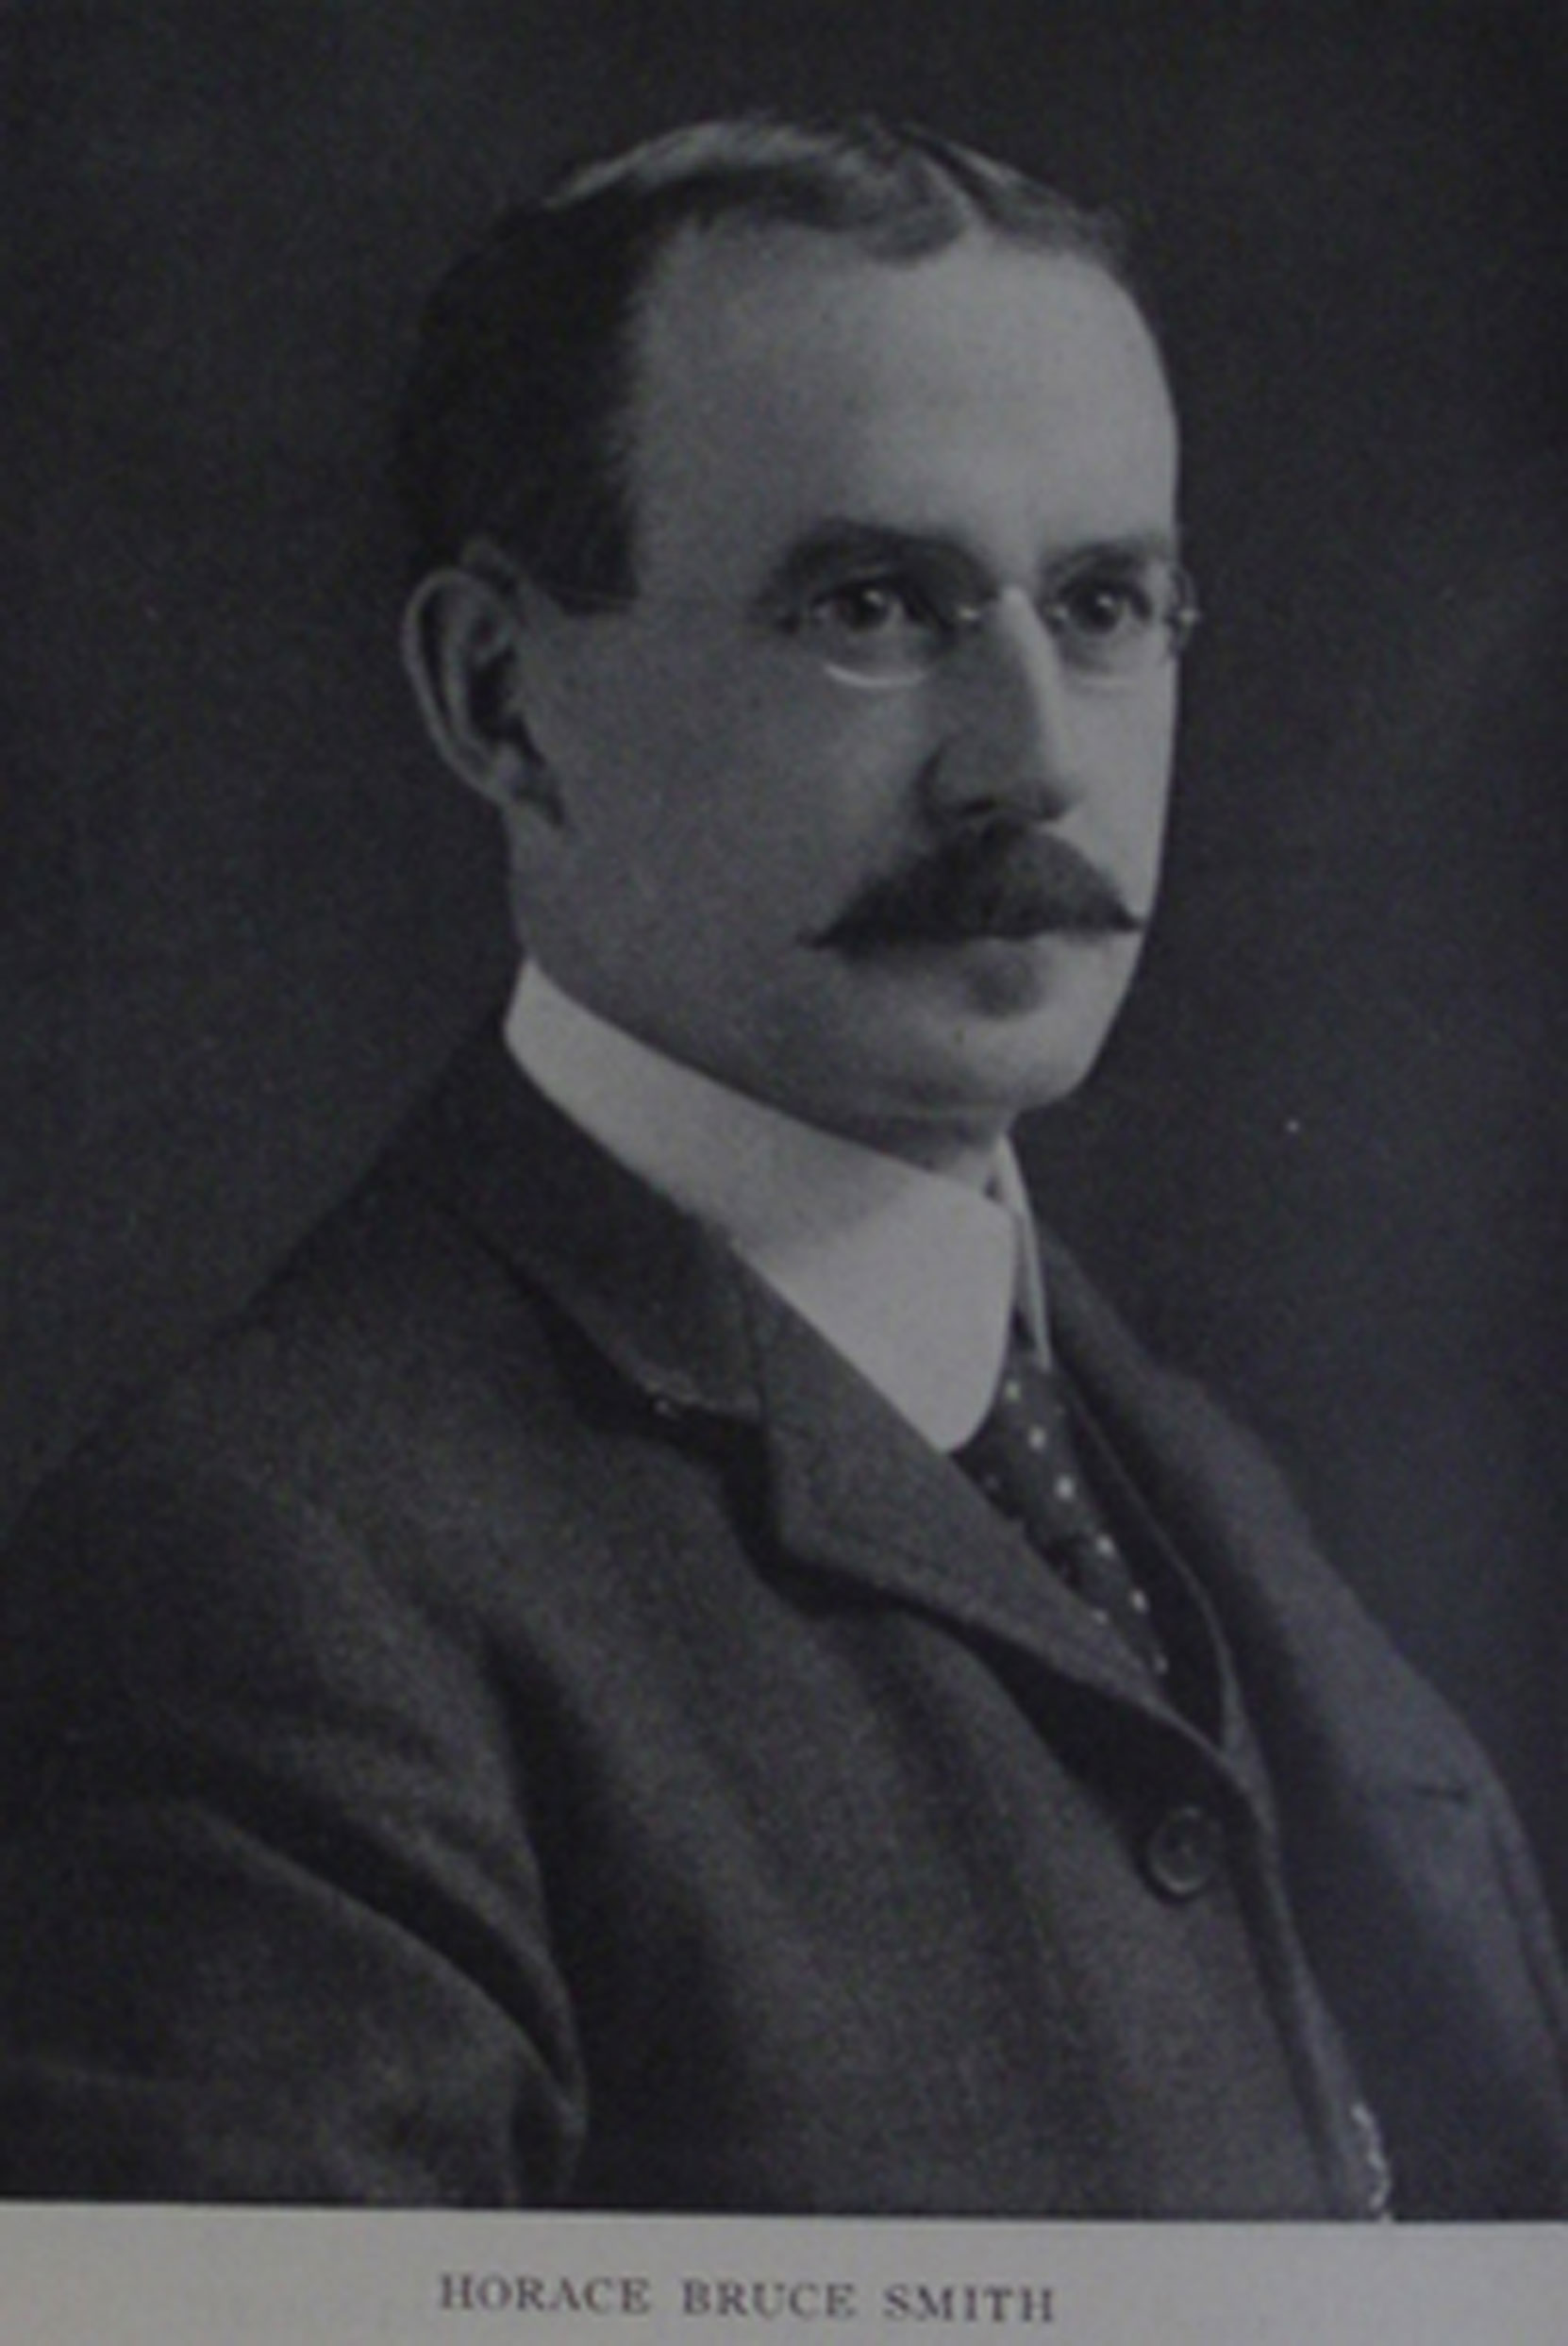 Horace Bruce Smith, circa 1910 (Author's collection)